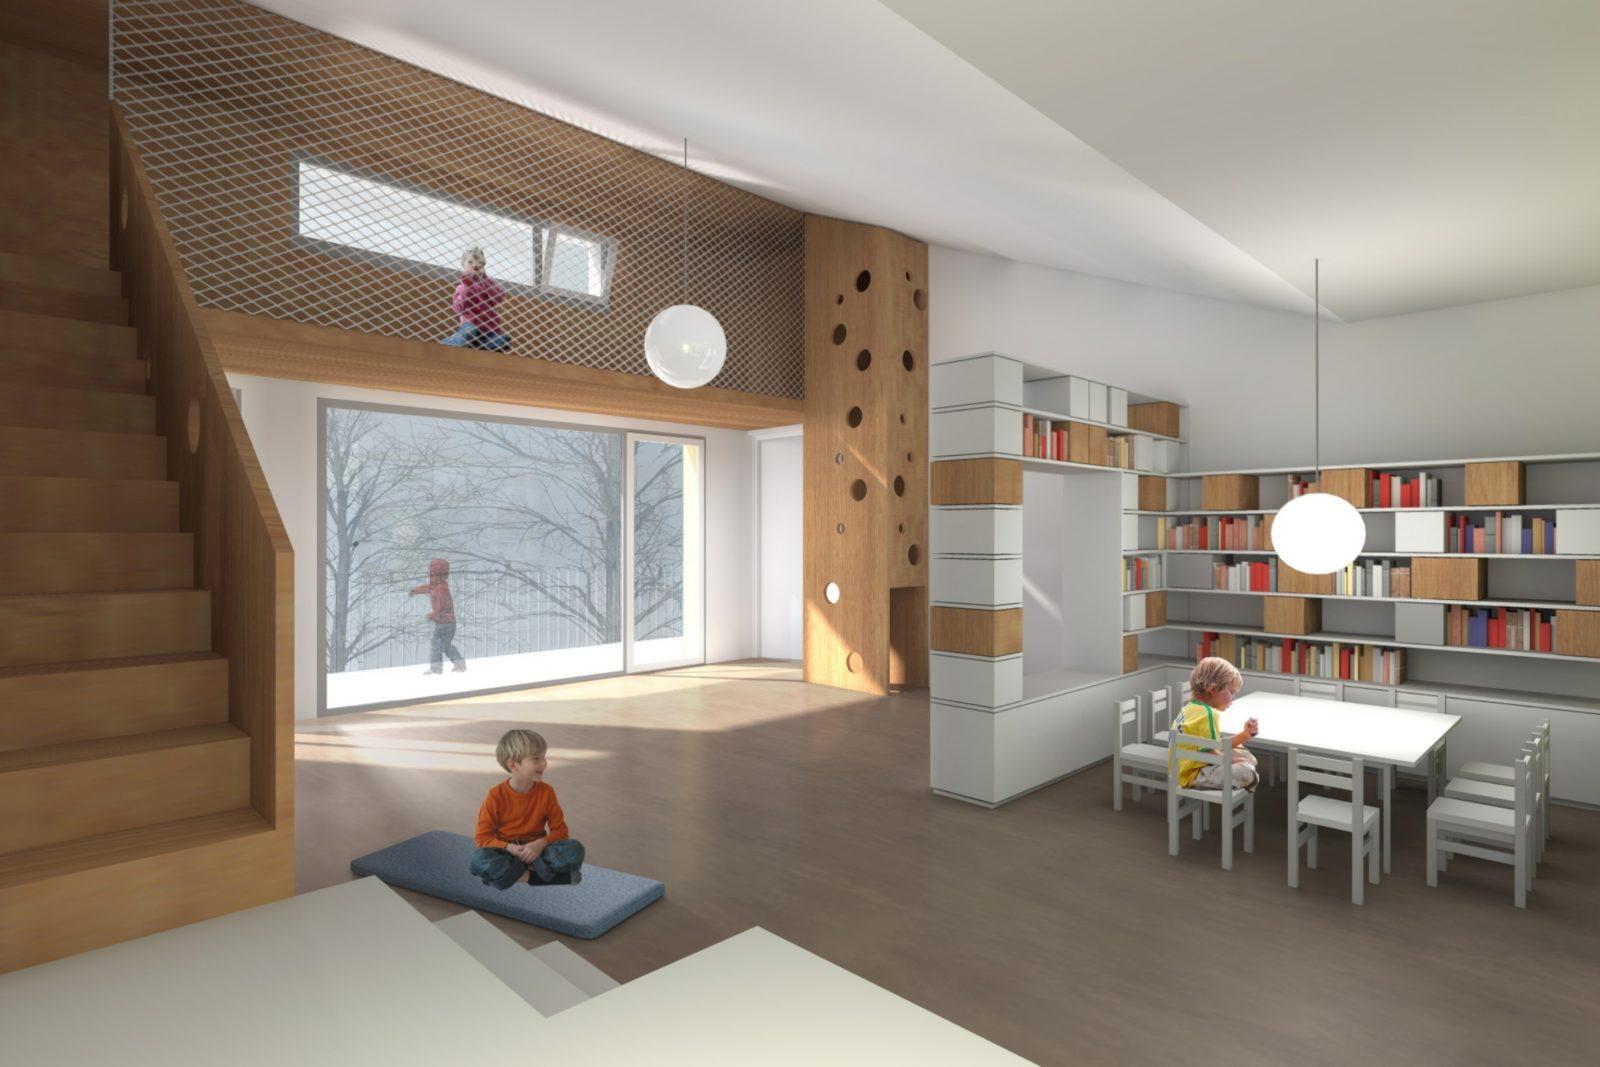 kita_Goyastrasse-Gruppenraum-Planung